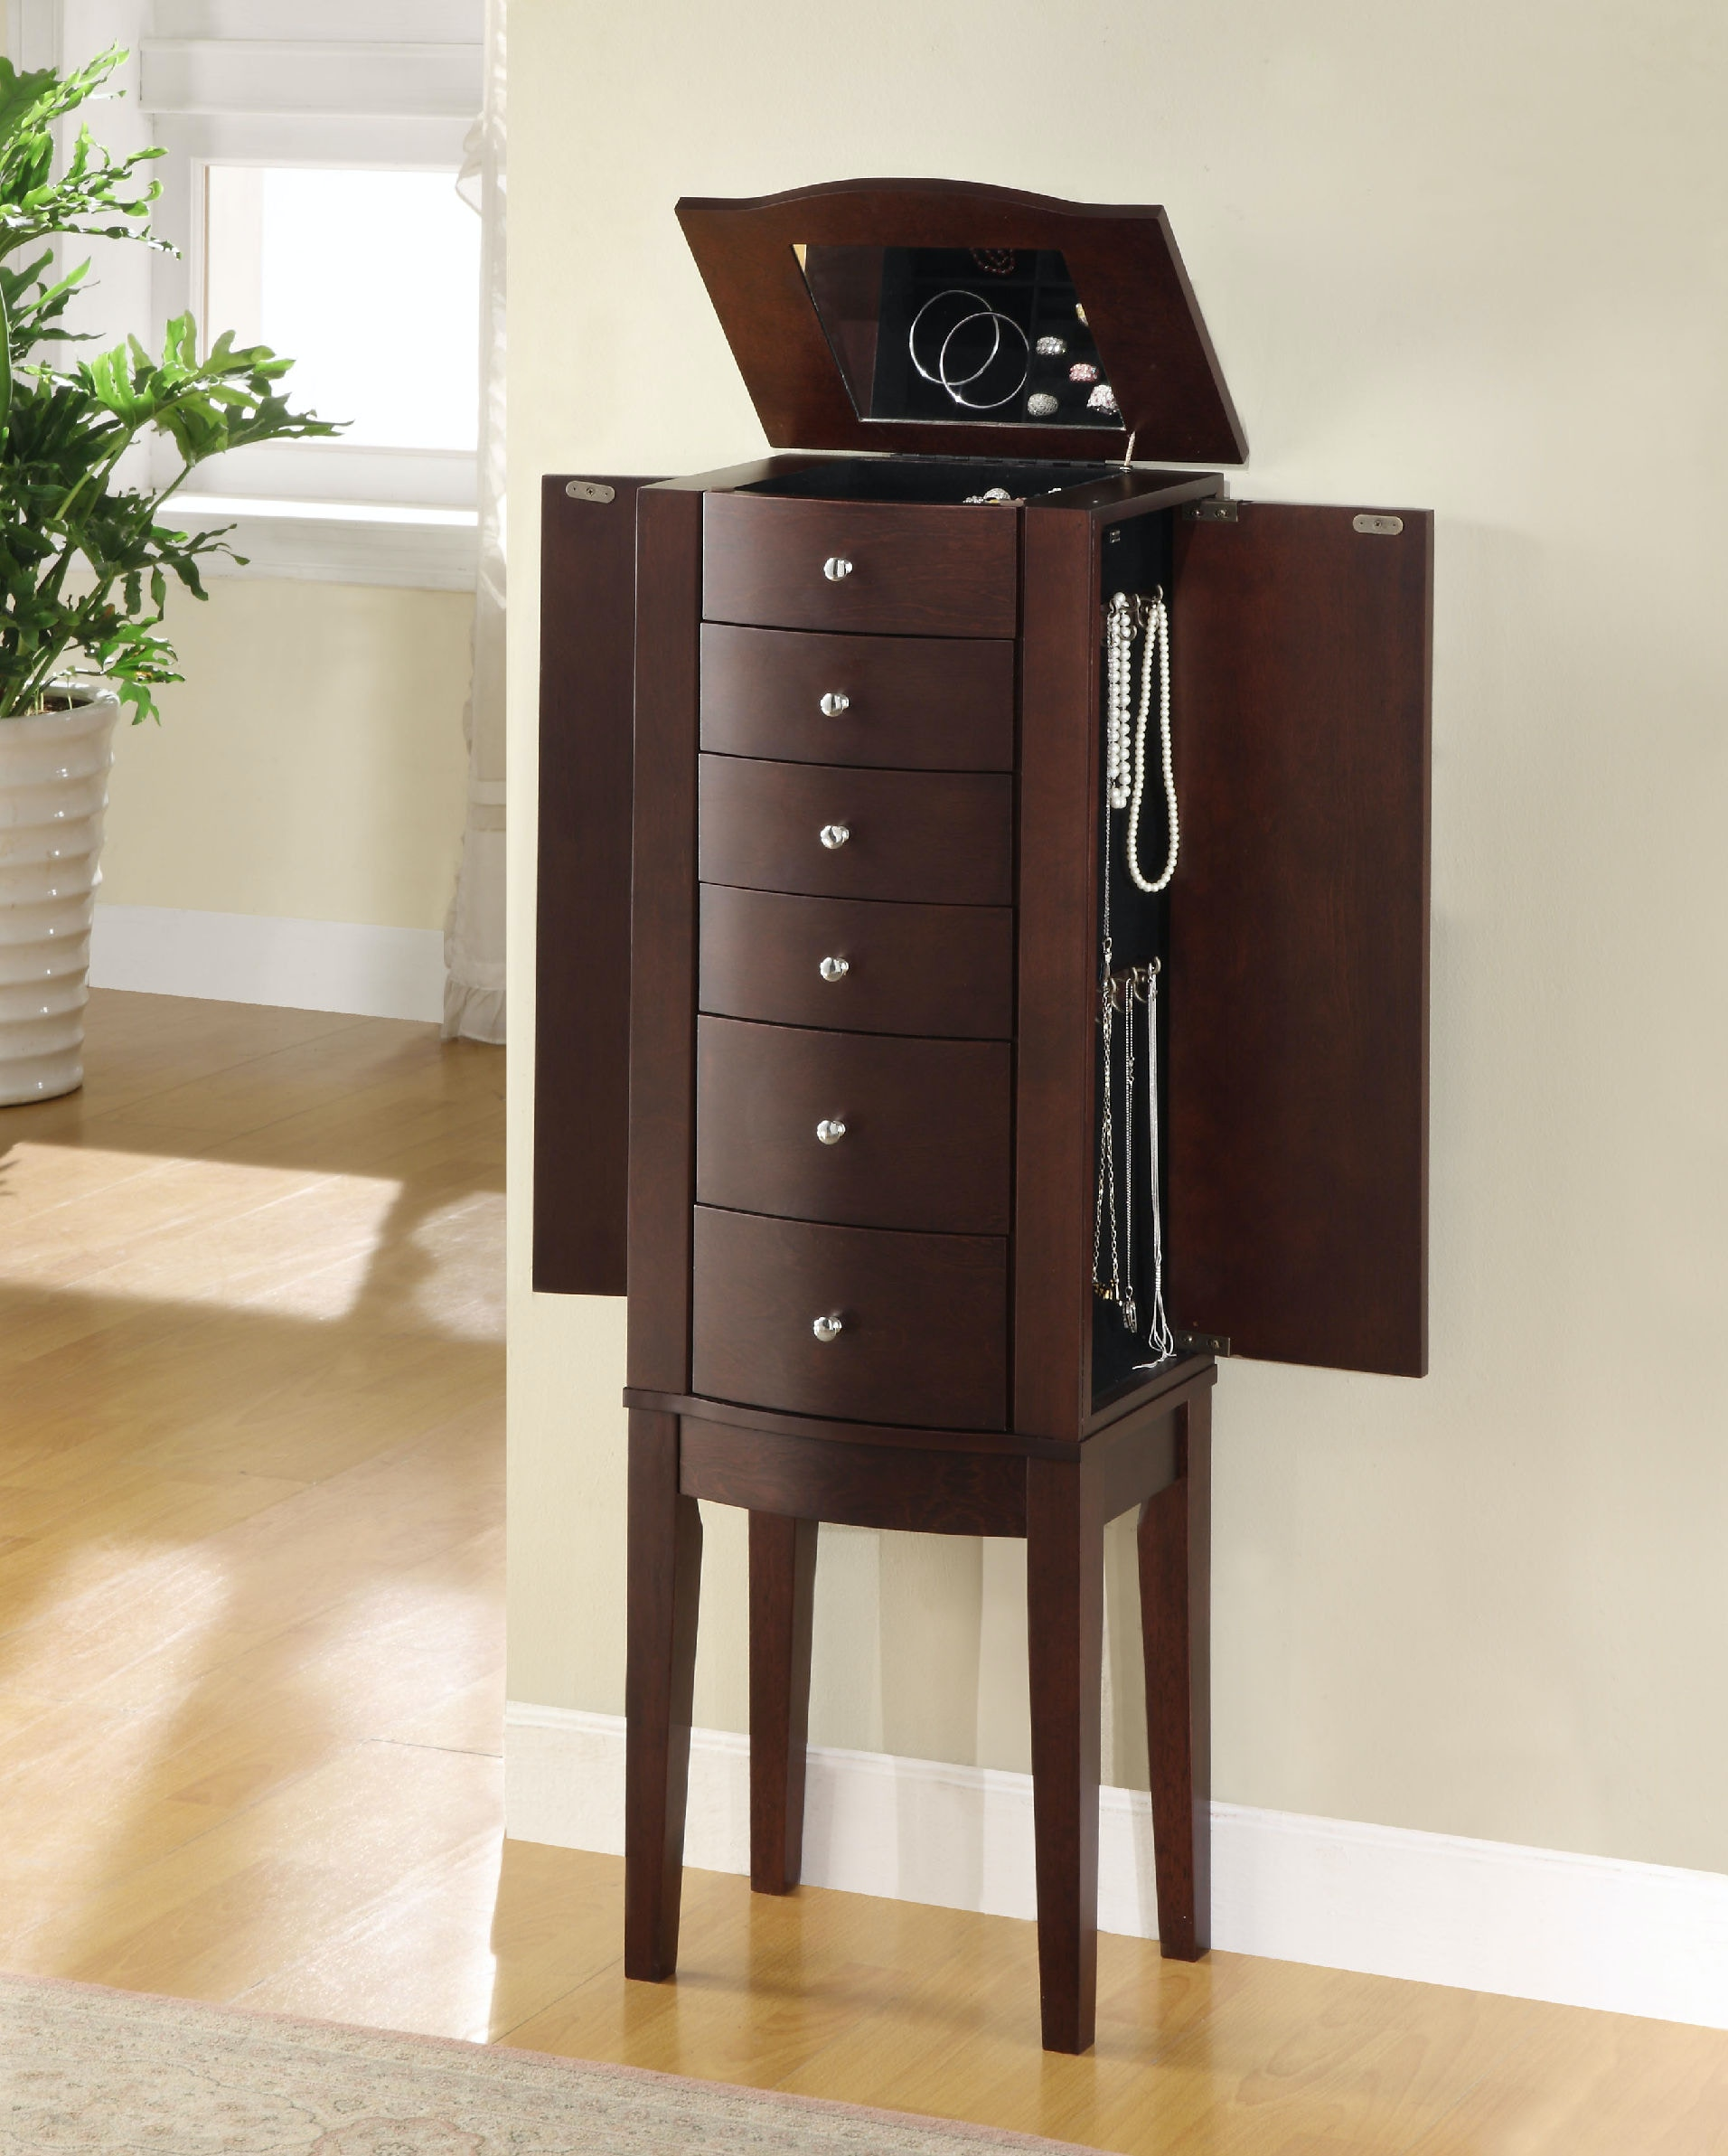 Powell Furniture Merlot Jewelry Armoire 398 315